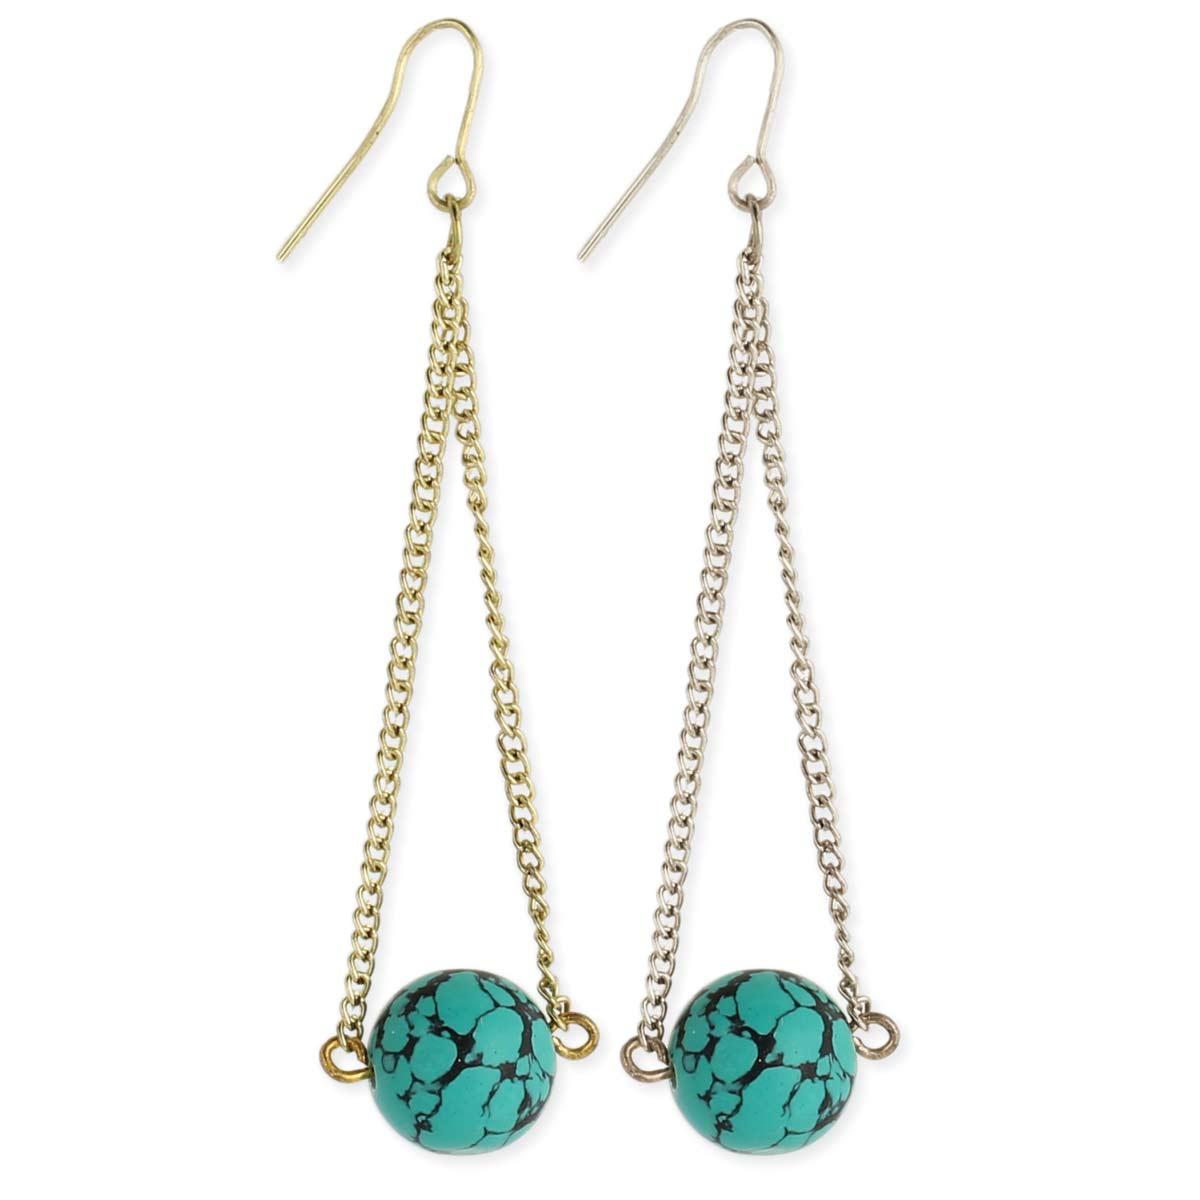 Turquoise Bead & Chain Earring